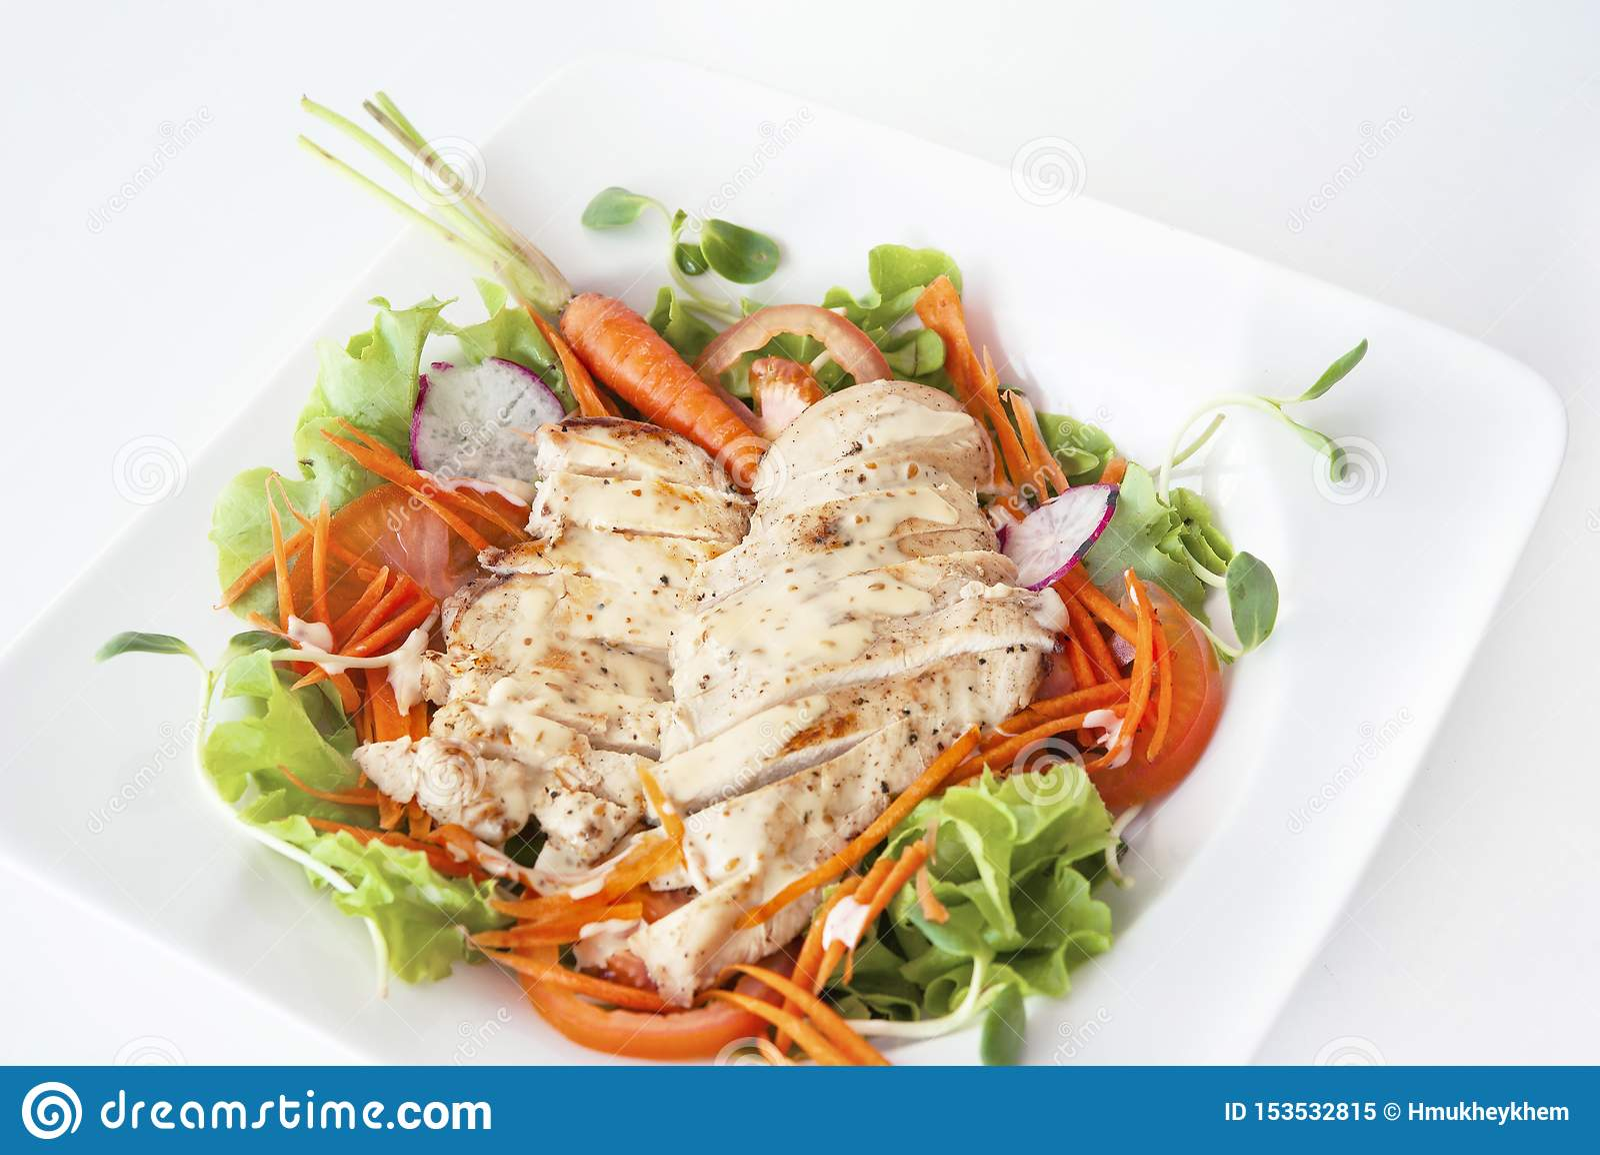 Mañana de la verdura de ensalada de pollo